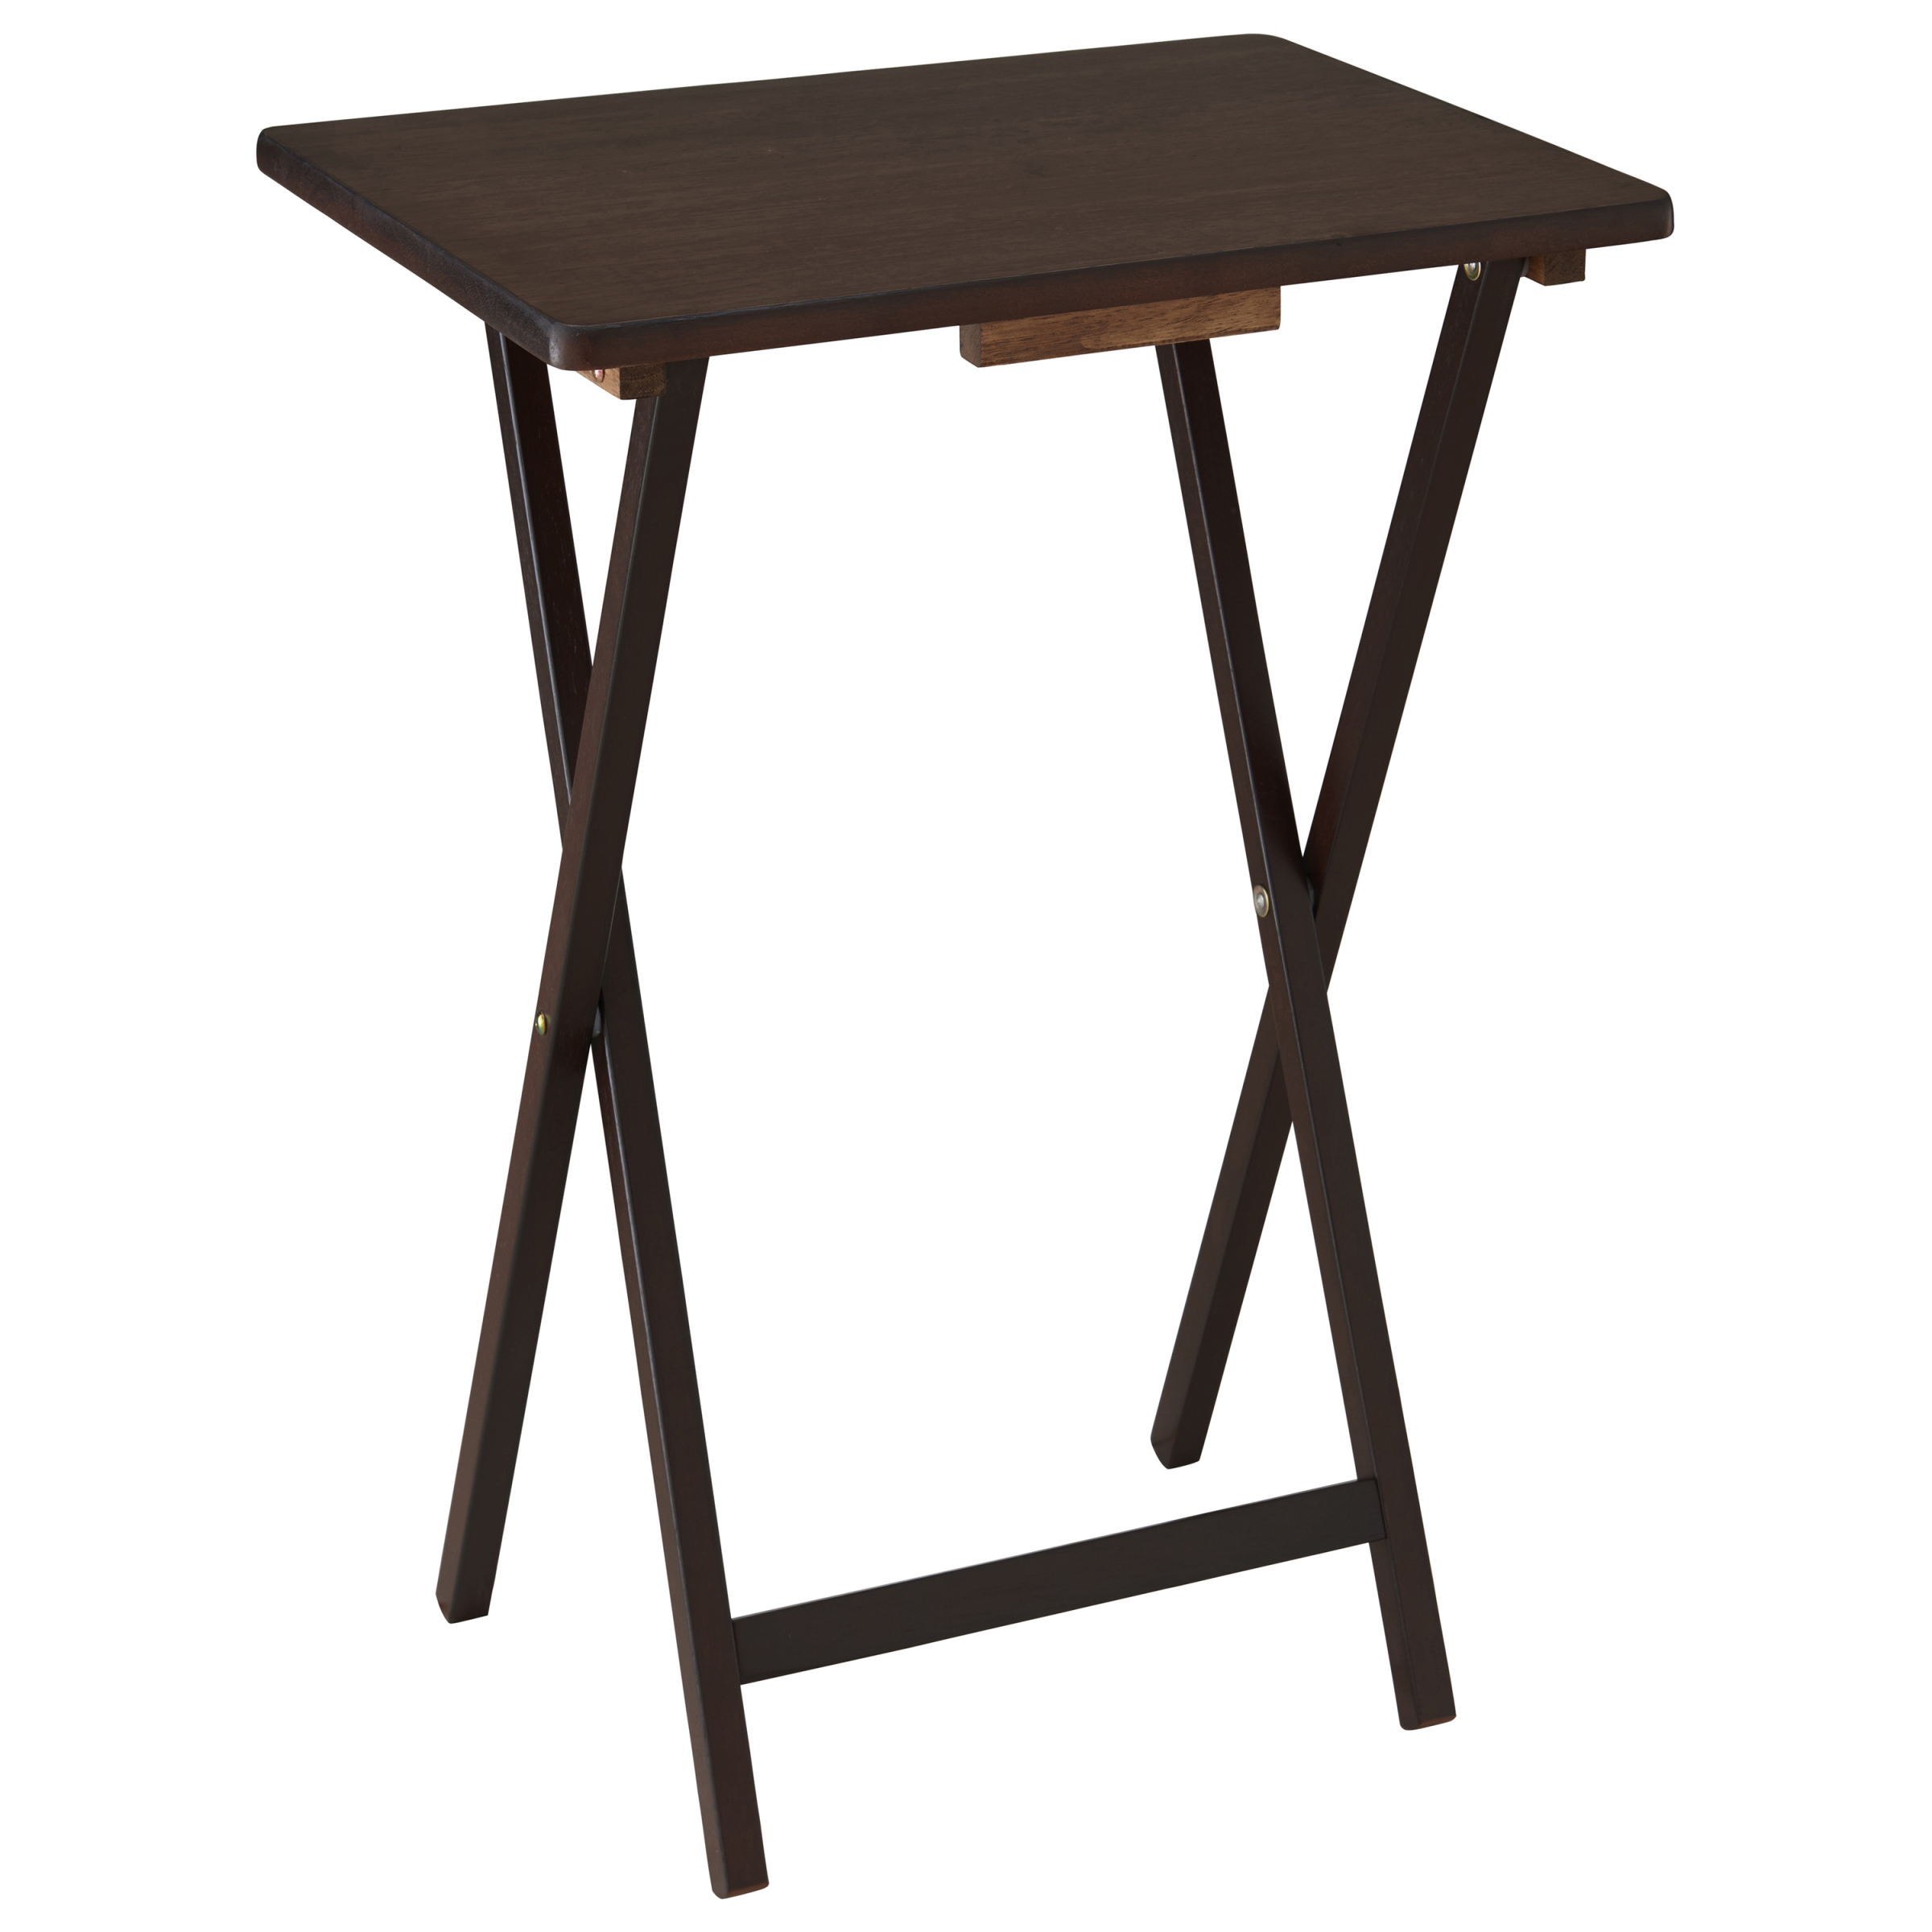 Mainstays 5-Piece Folding Tray Table Set, Walnut